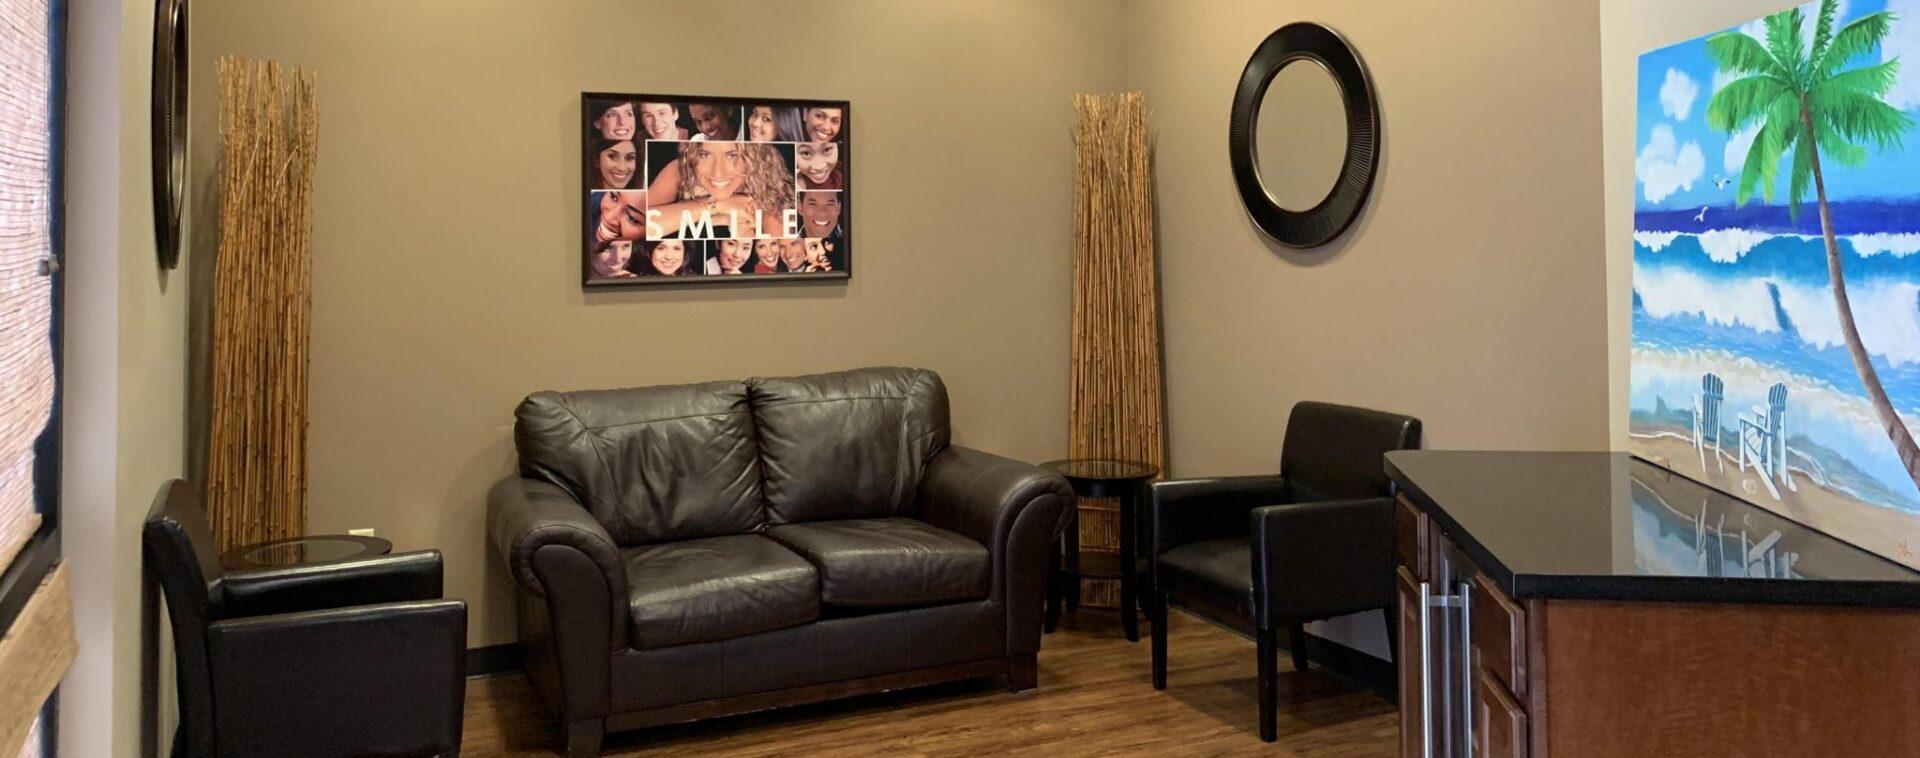 Reflections Dental Waiting Room